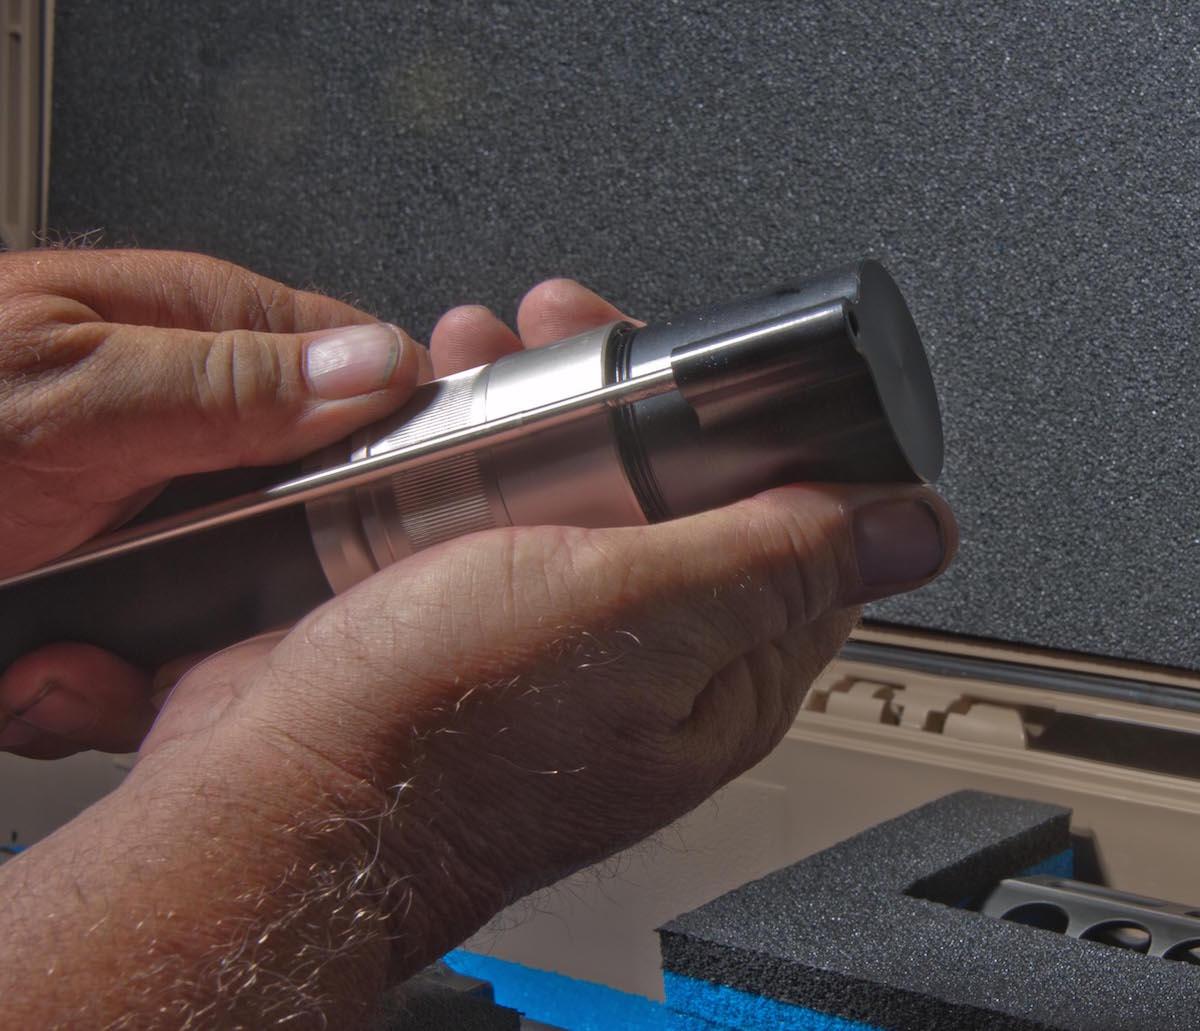 DRD Tactical Takedown Kivaari Semi-Auto  338 Lapua Magnum